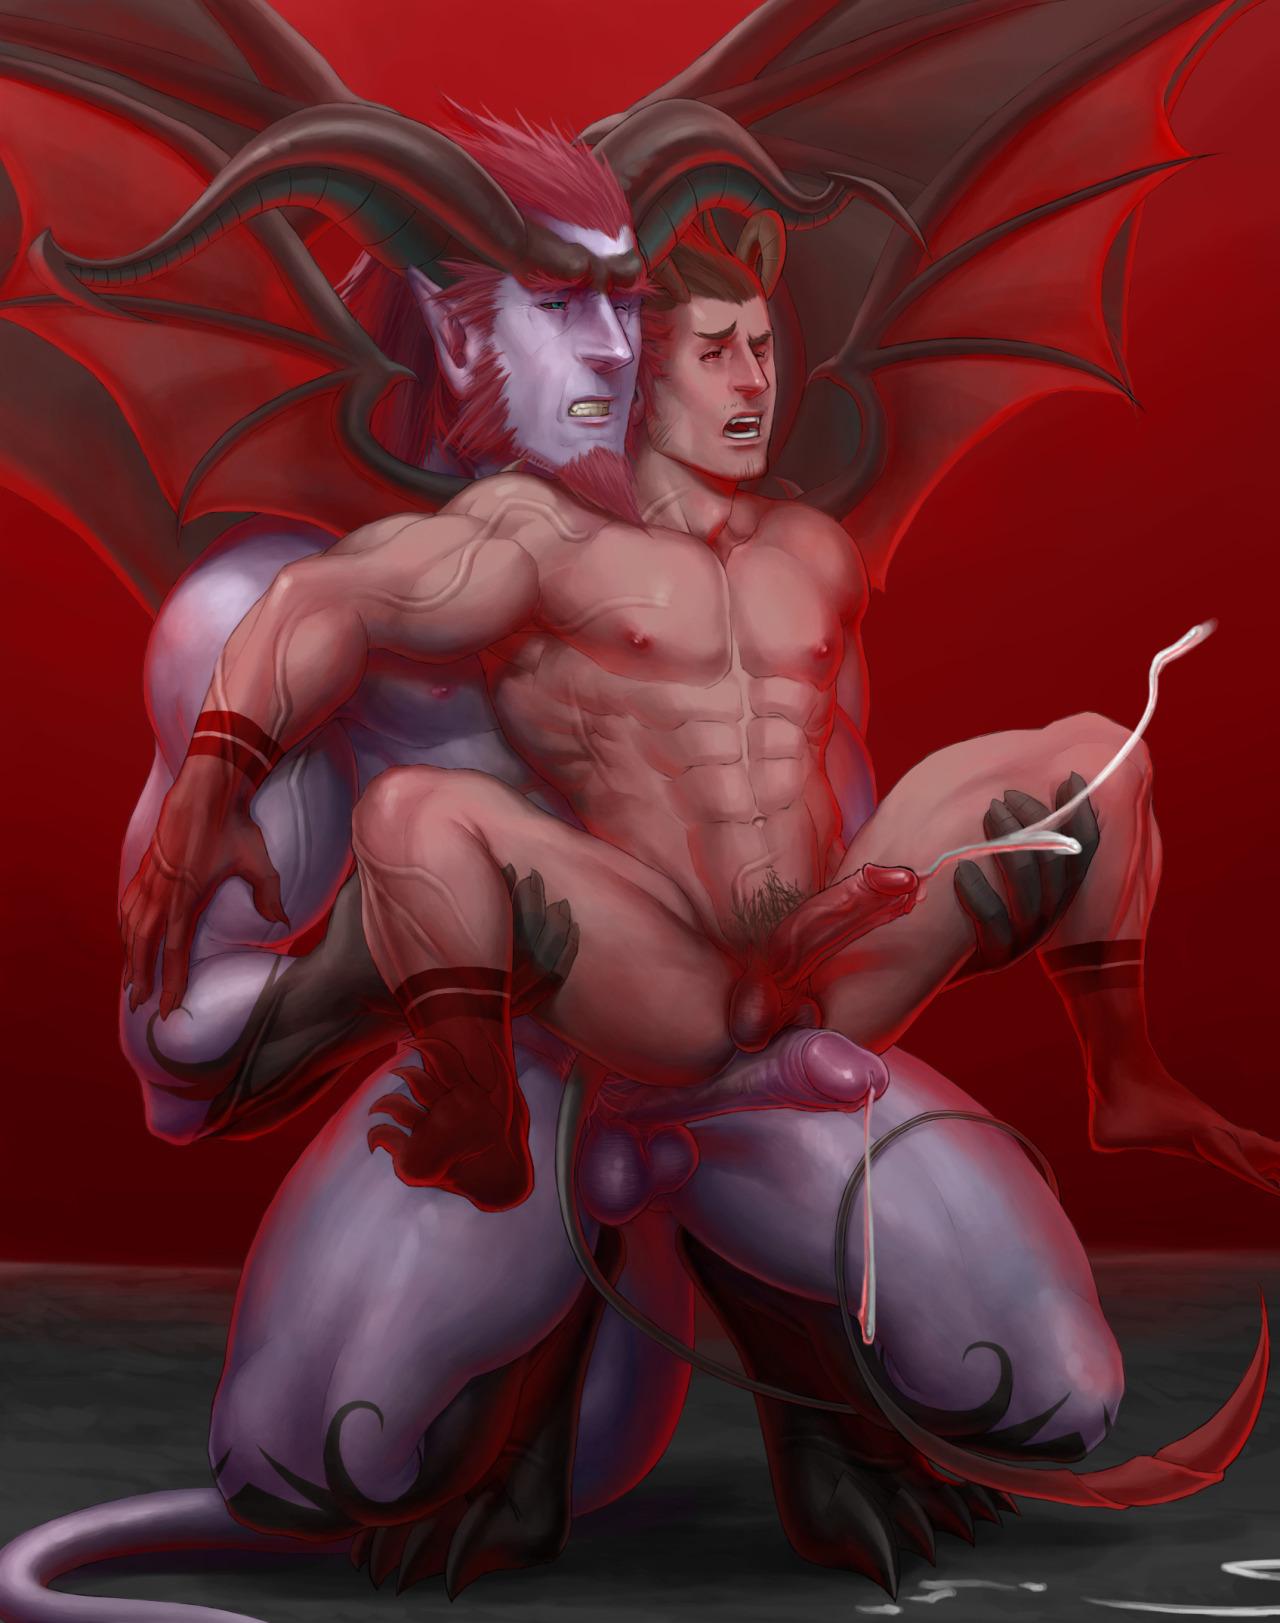 gey-porno-bogi